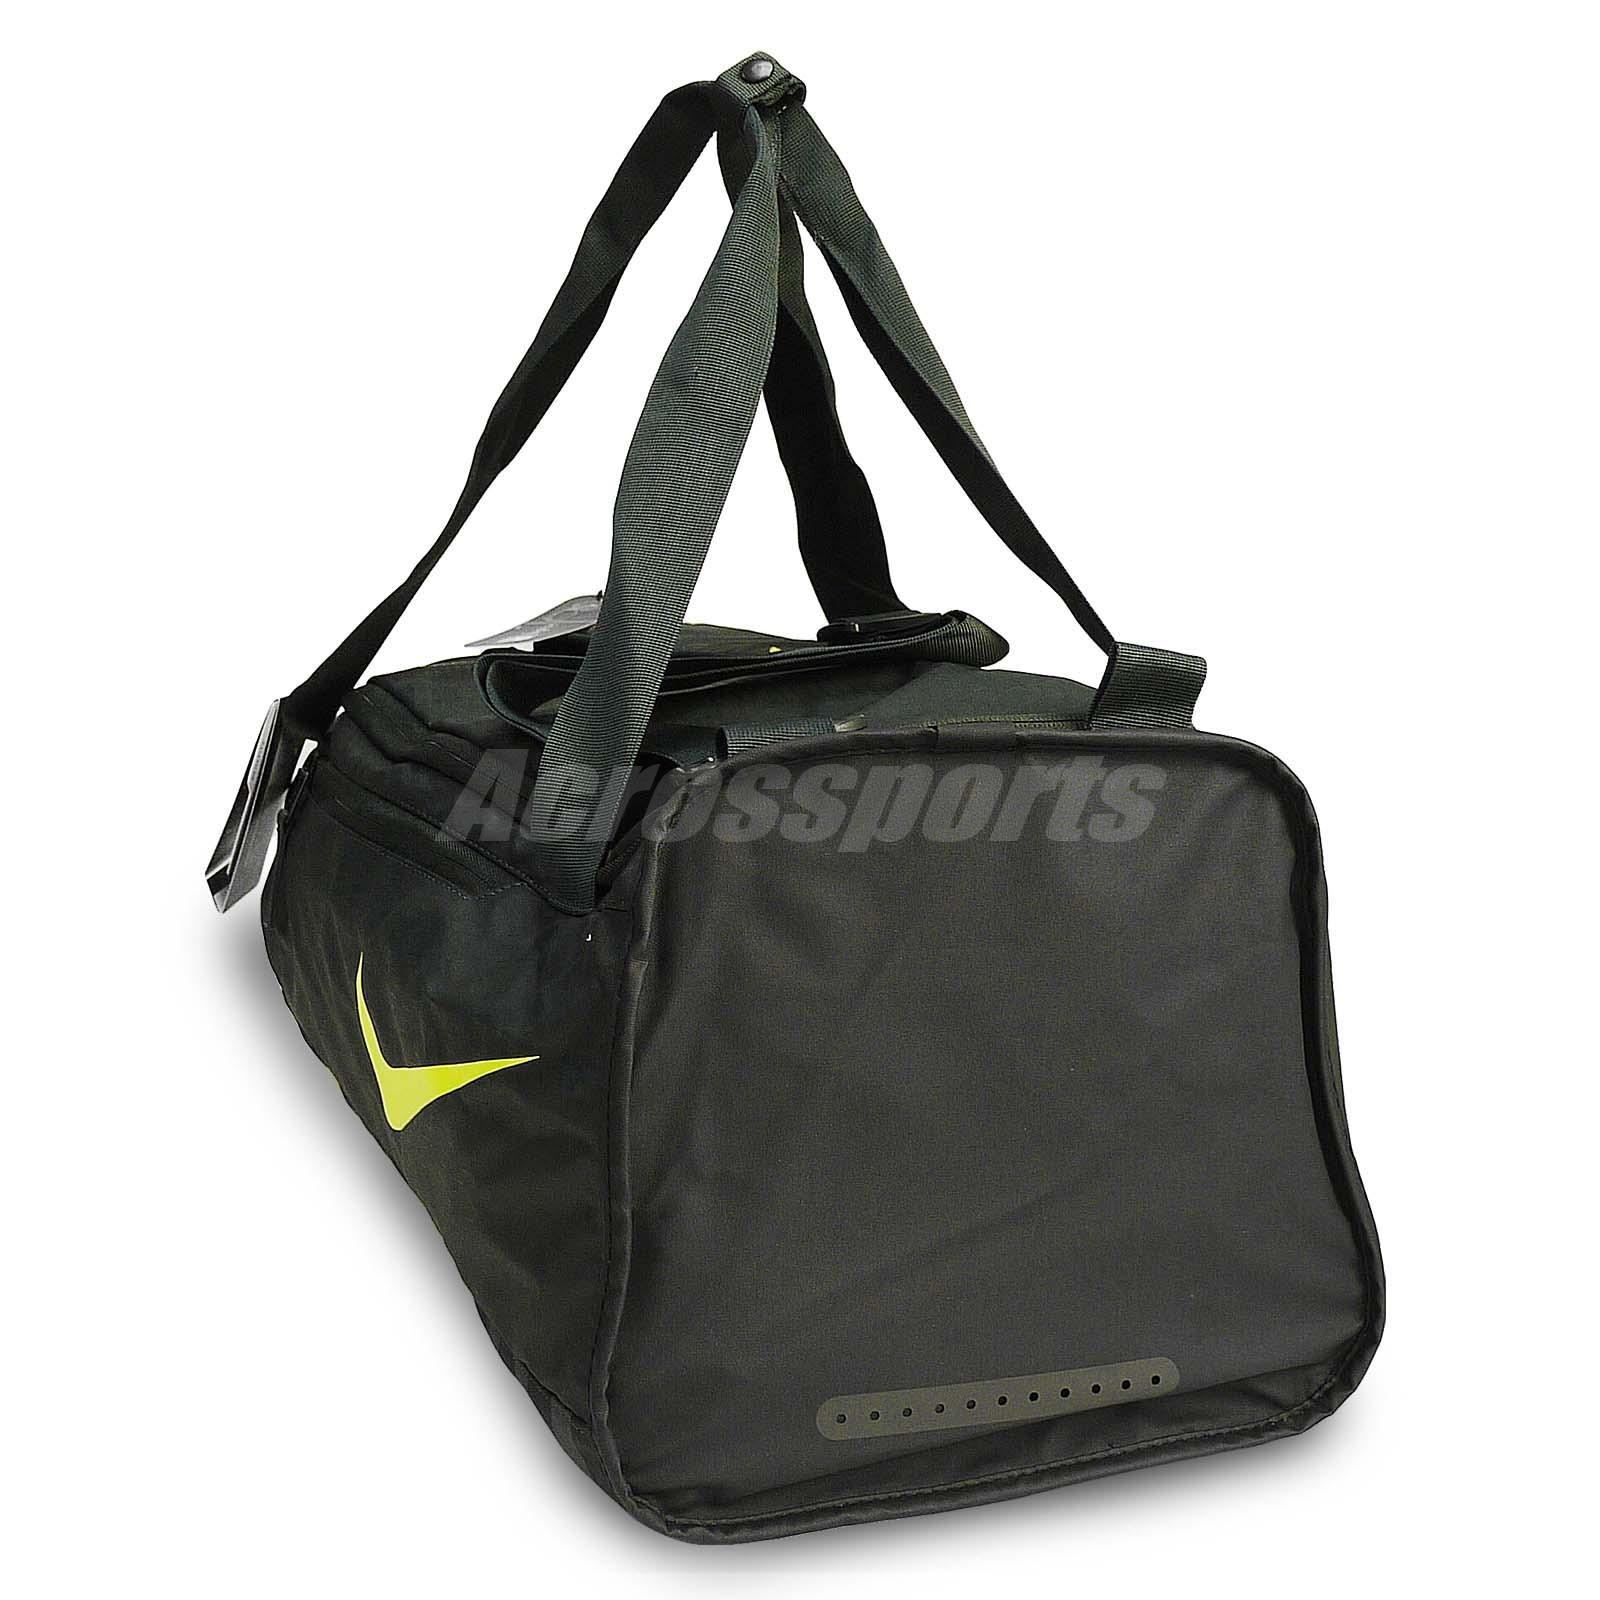 1f82dbb887d2 Nike Alpha Adapt Cross Body Small Duffel Bag Workout Gym Black Volt ...